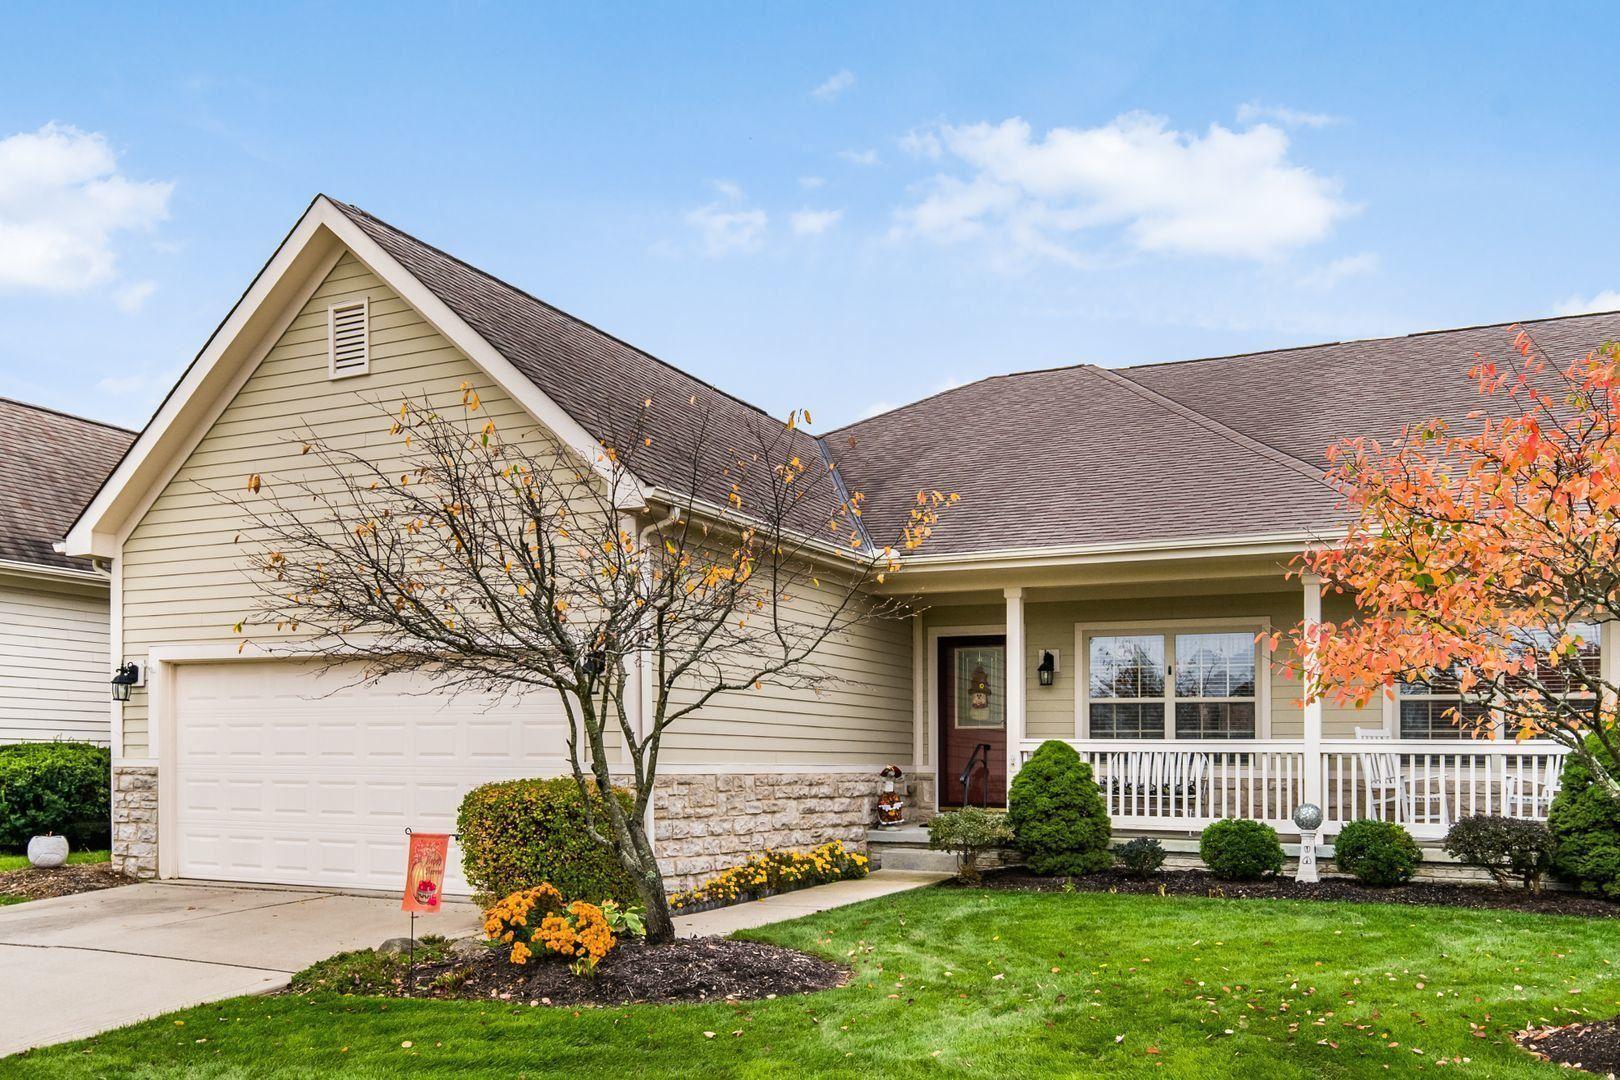 Photo of 399 Wyndham Park N, Westerville, OH 43082 (MLS # 220038462)